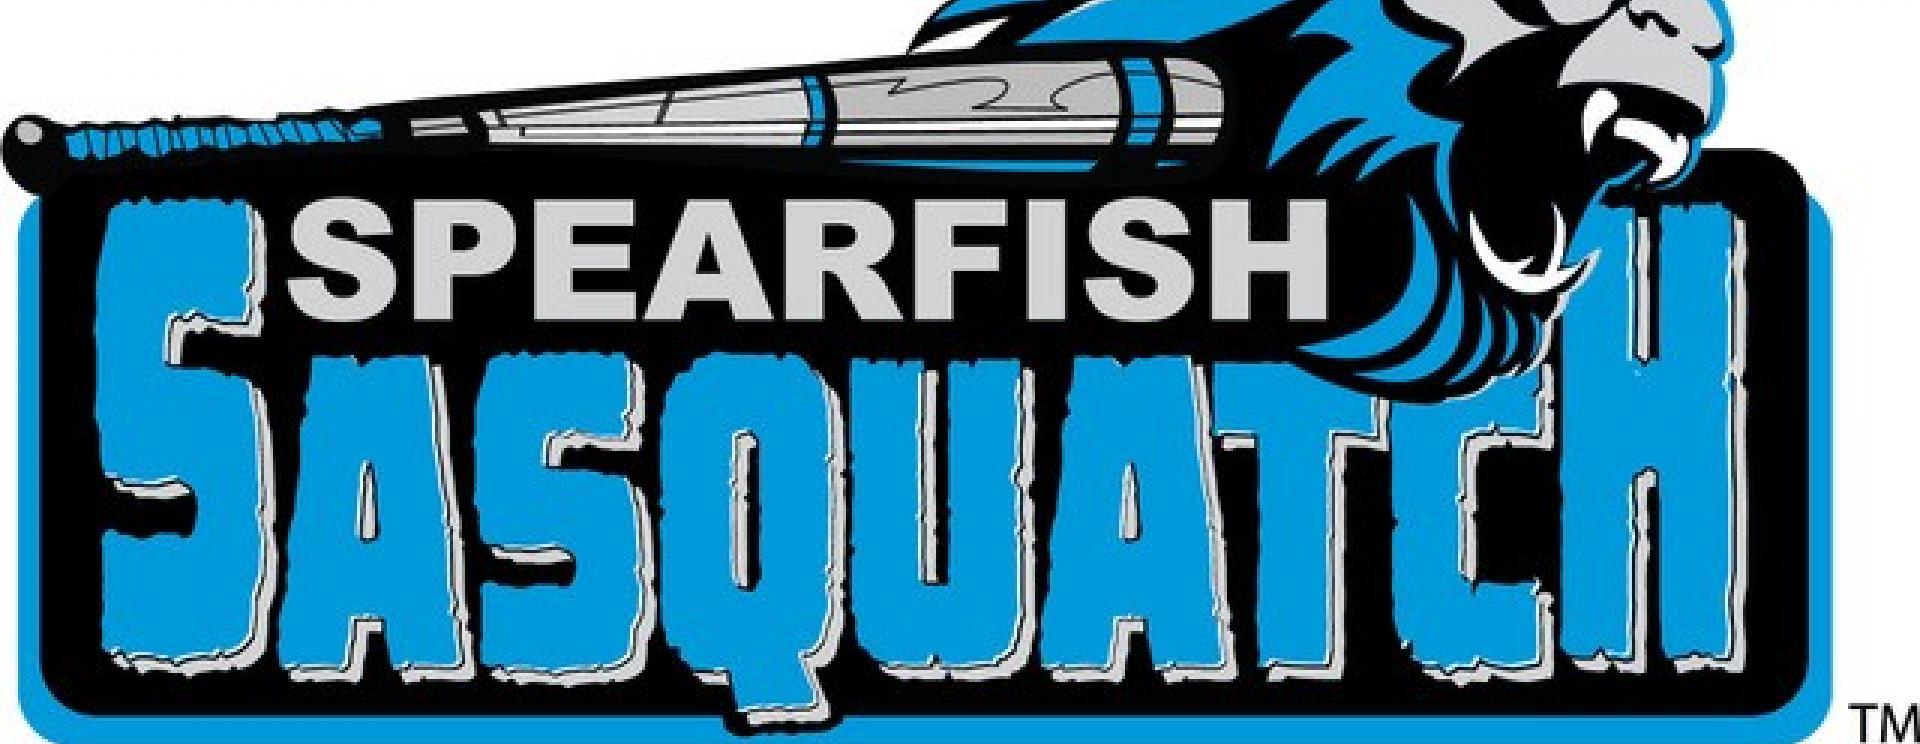 Spearfish Sasquatch vs Hub City Hotshots